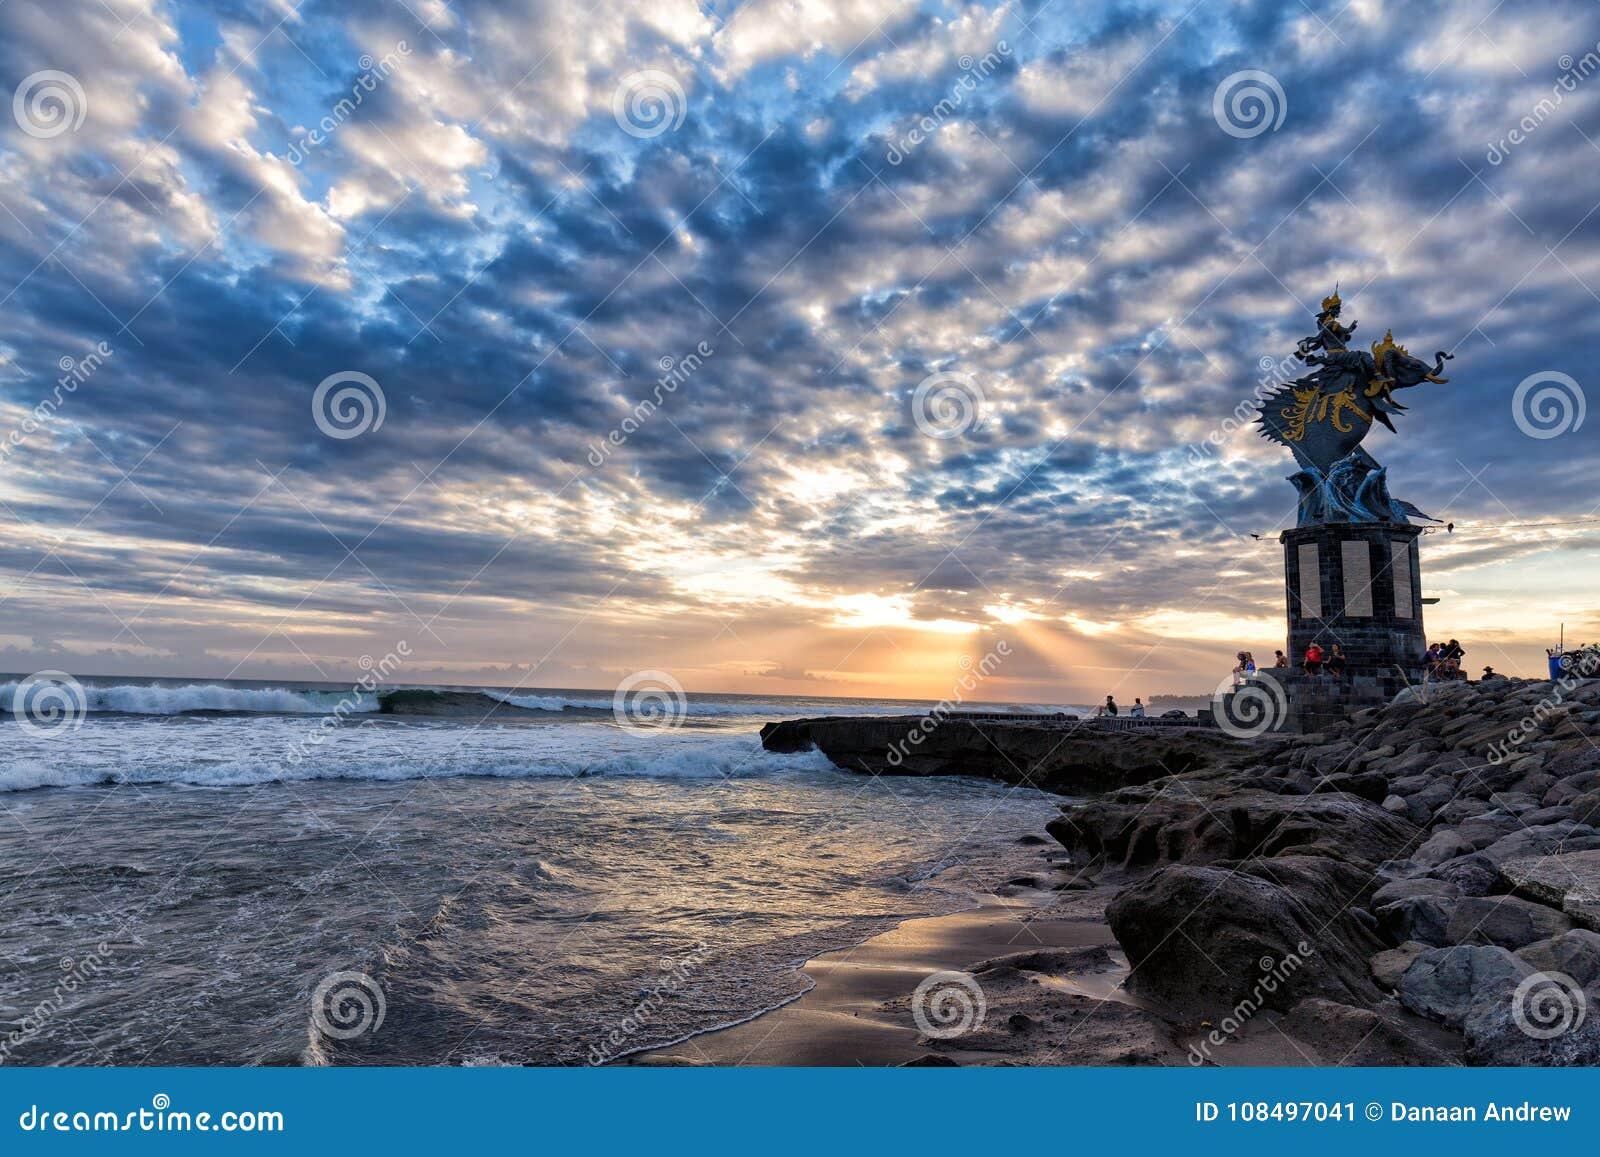 Fantastic Sunset View in Canggu